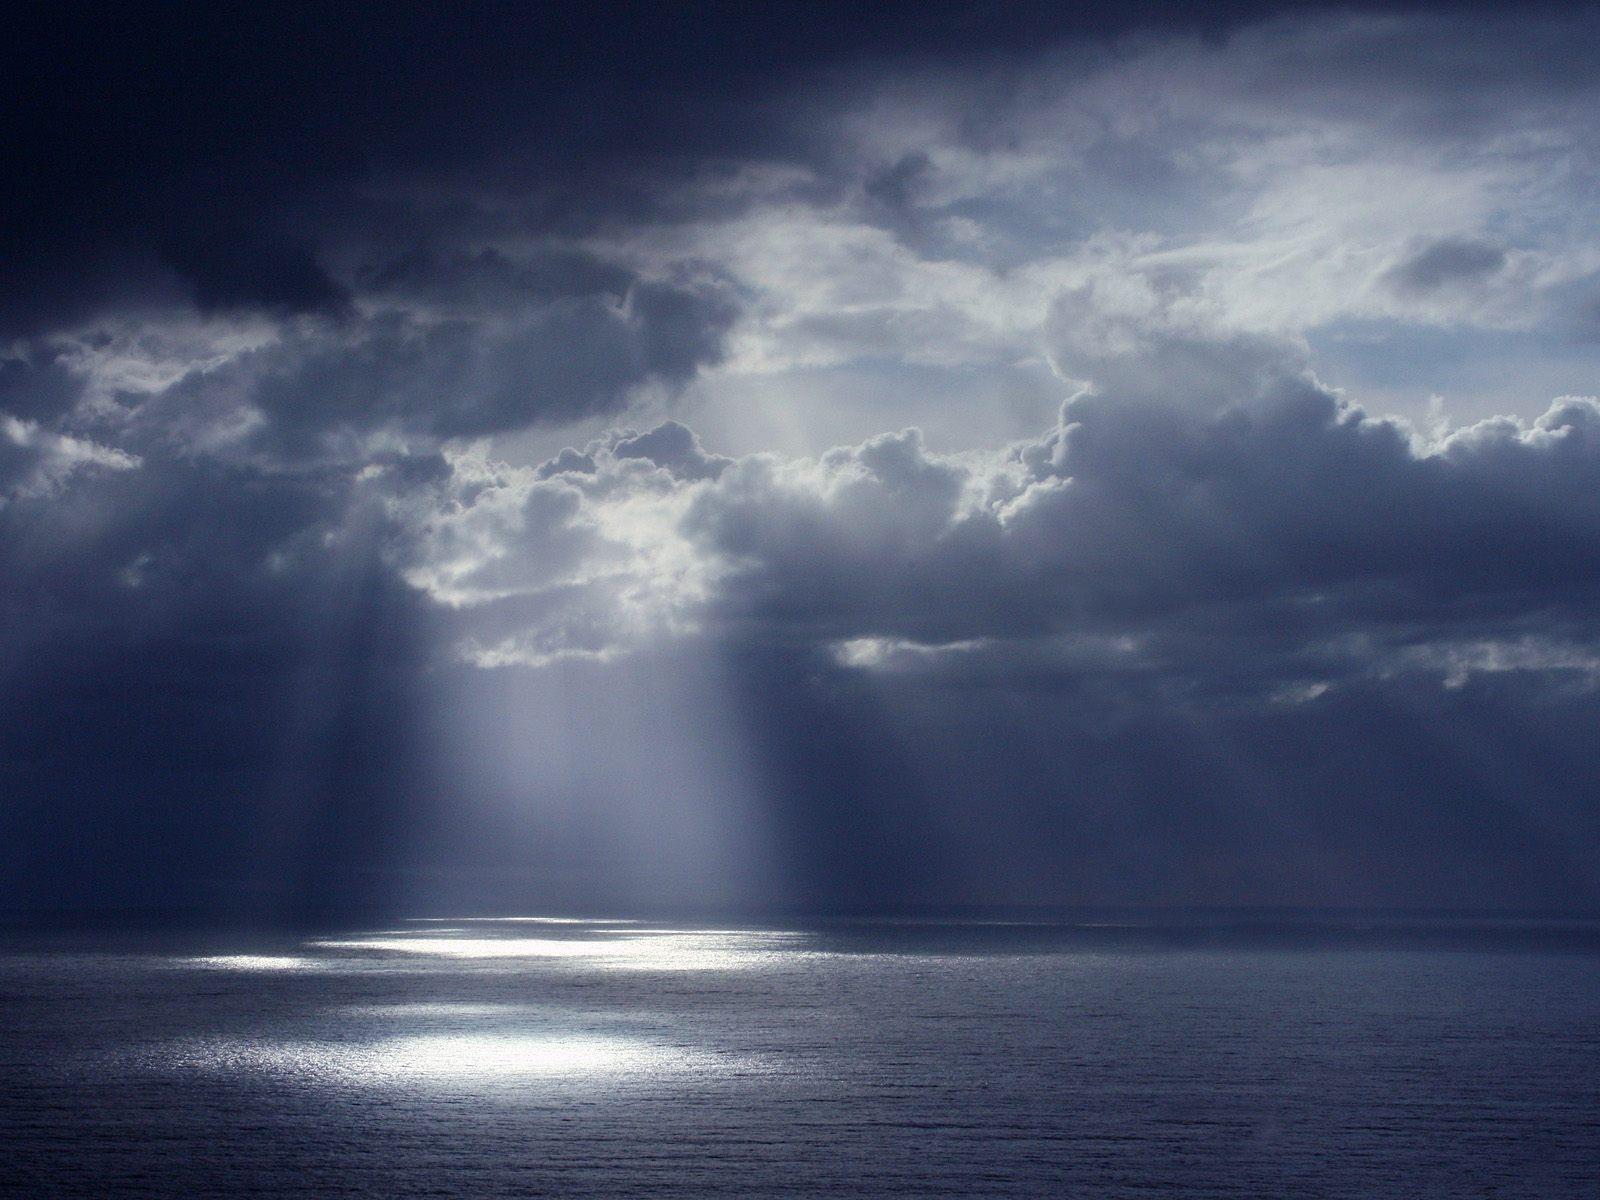 http://2.bp.blogspot.com/-Pg4j3cRjW2s/TtUwhXMxpfI/AAAAAAAACv0/yQKs1jsSyIw/s1600/6303-heavenly-rays-wallpapers.jpg